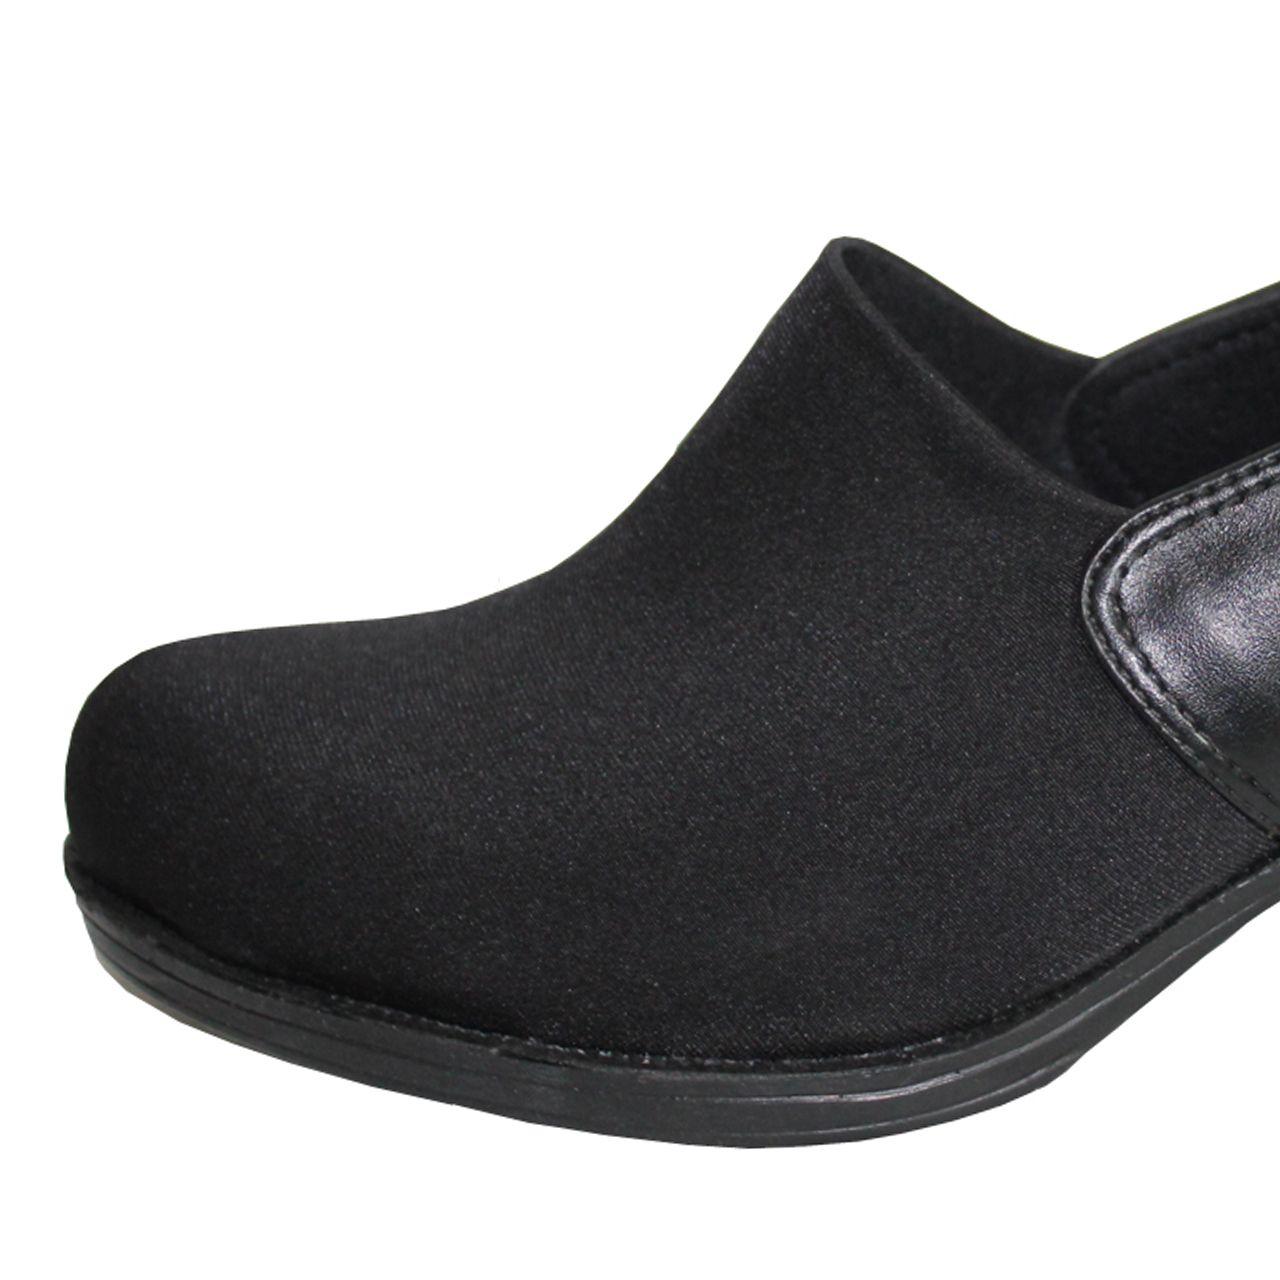 کفش زنانه کد 689 -  - 1